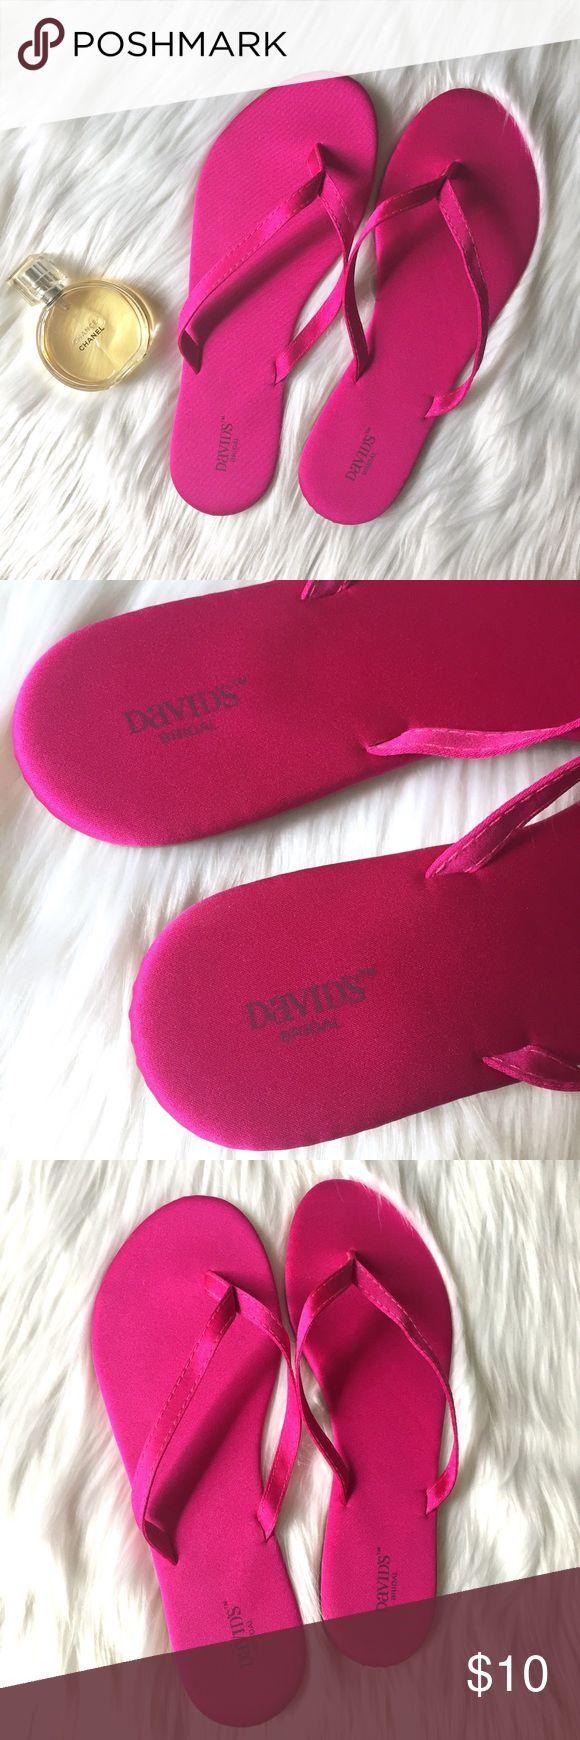 Davids's Bridal Pink Flip Flops Darling fuchsia satin flip flips! Size Medium (7-8) in great condition! davids bridal Shoes Sandals